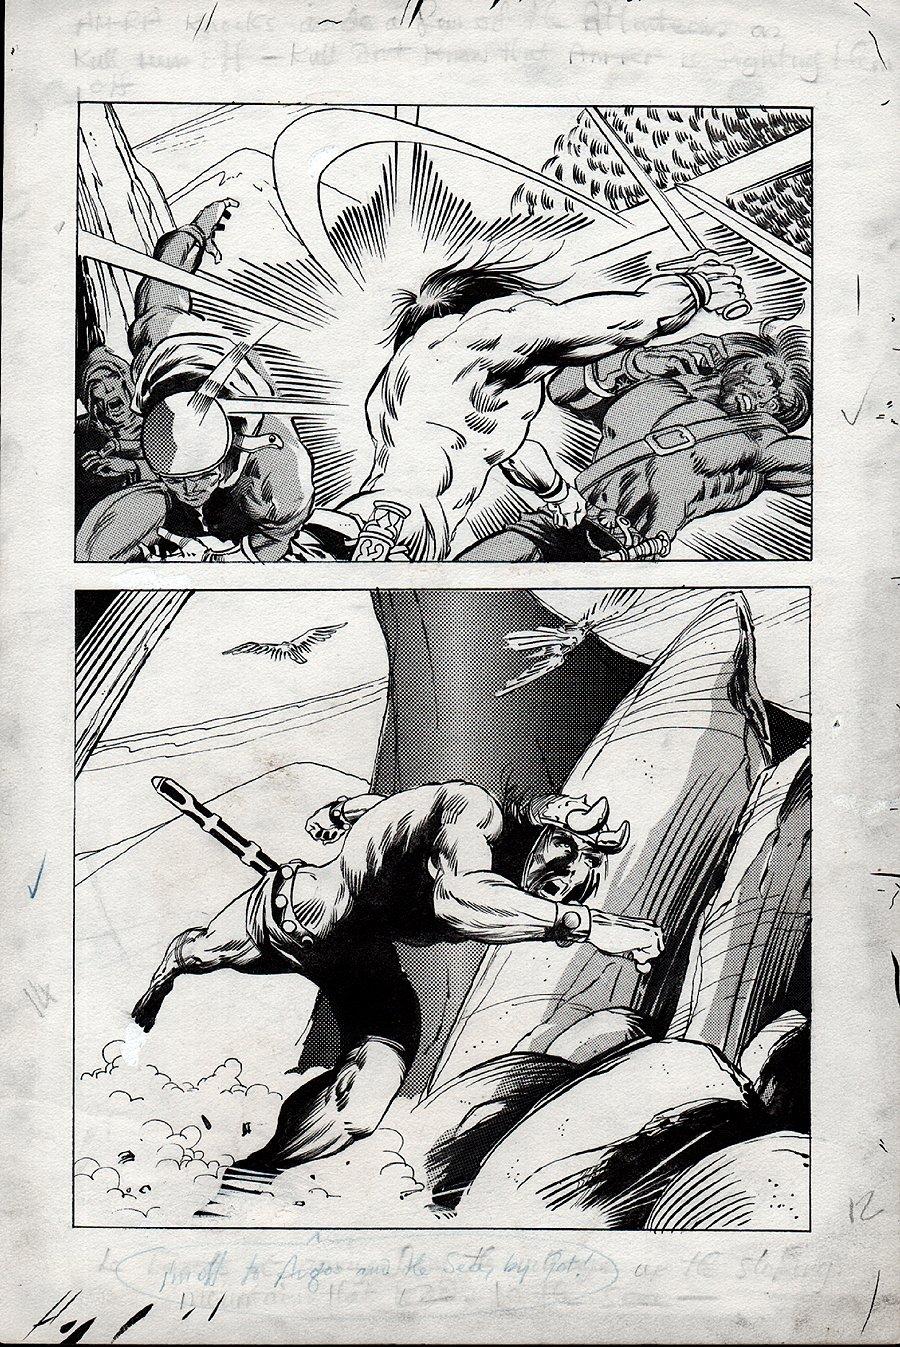 Kull Of Atlantis p 14 (Precursor To Conan The Barbarian #1) 1969-1970